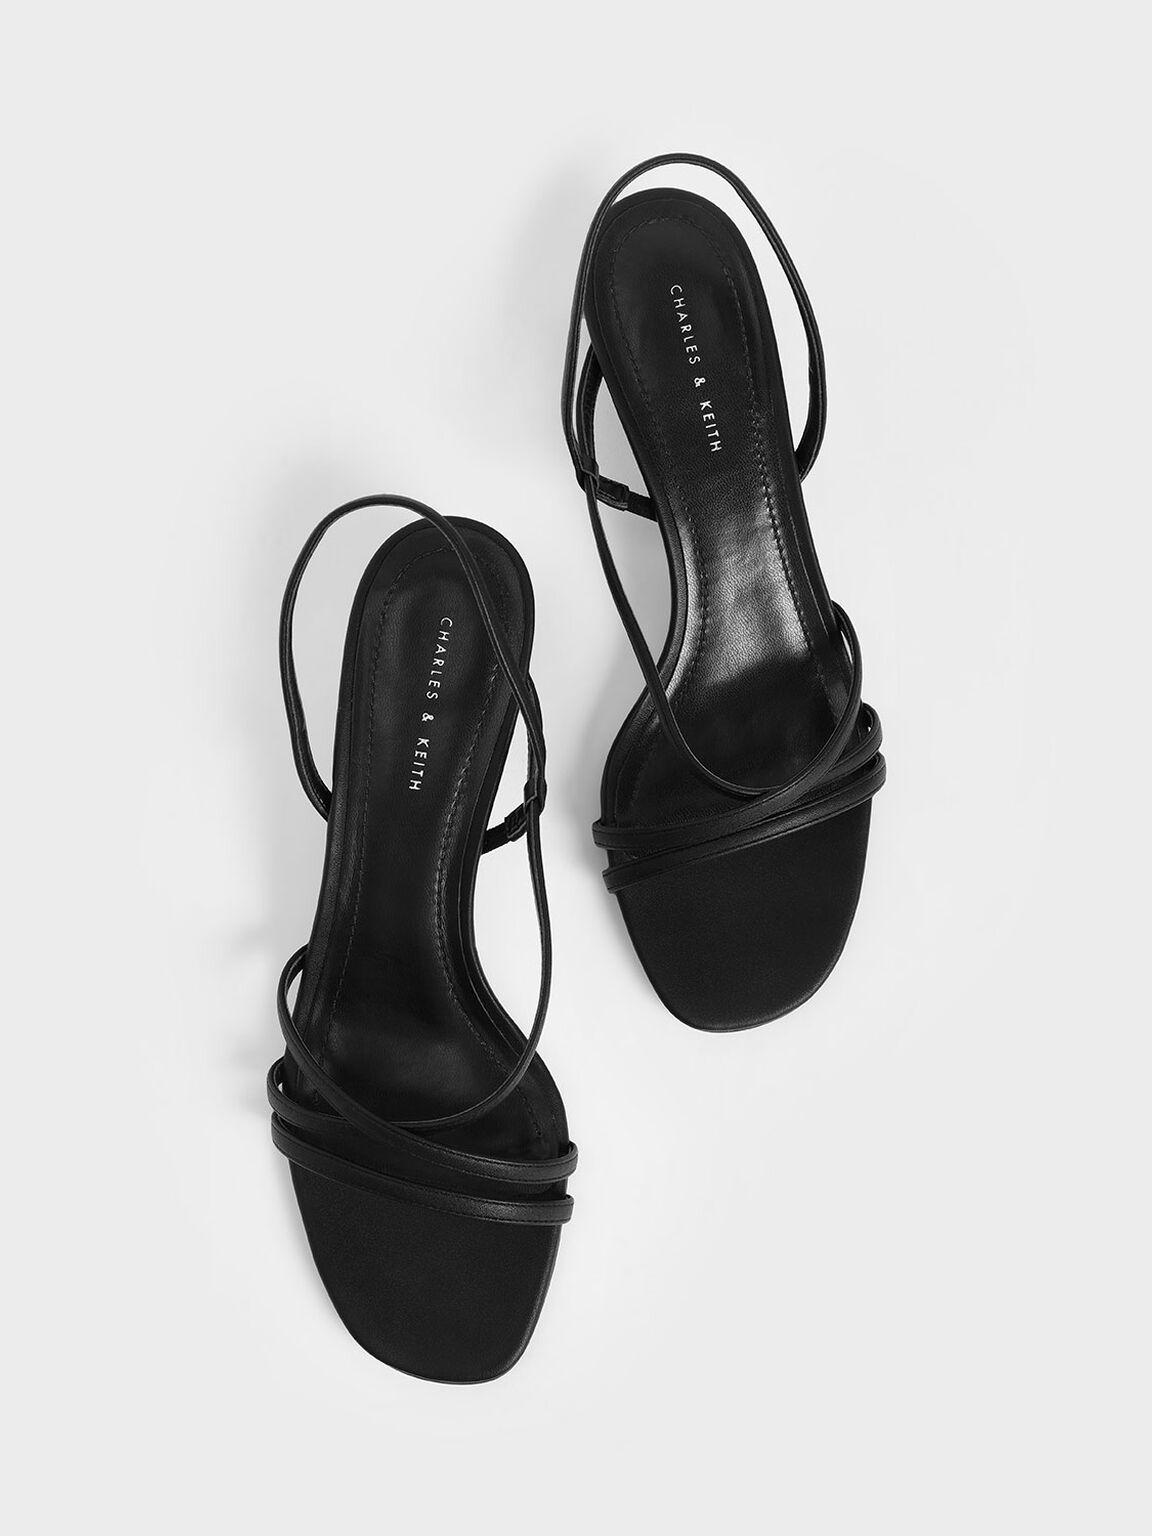 Strappy Cylindrical Heel Sandals, Black, hi-res